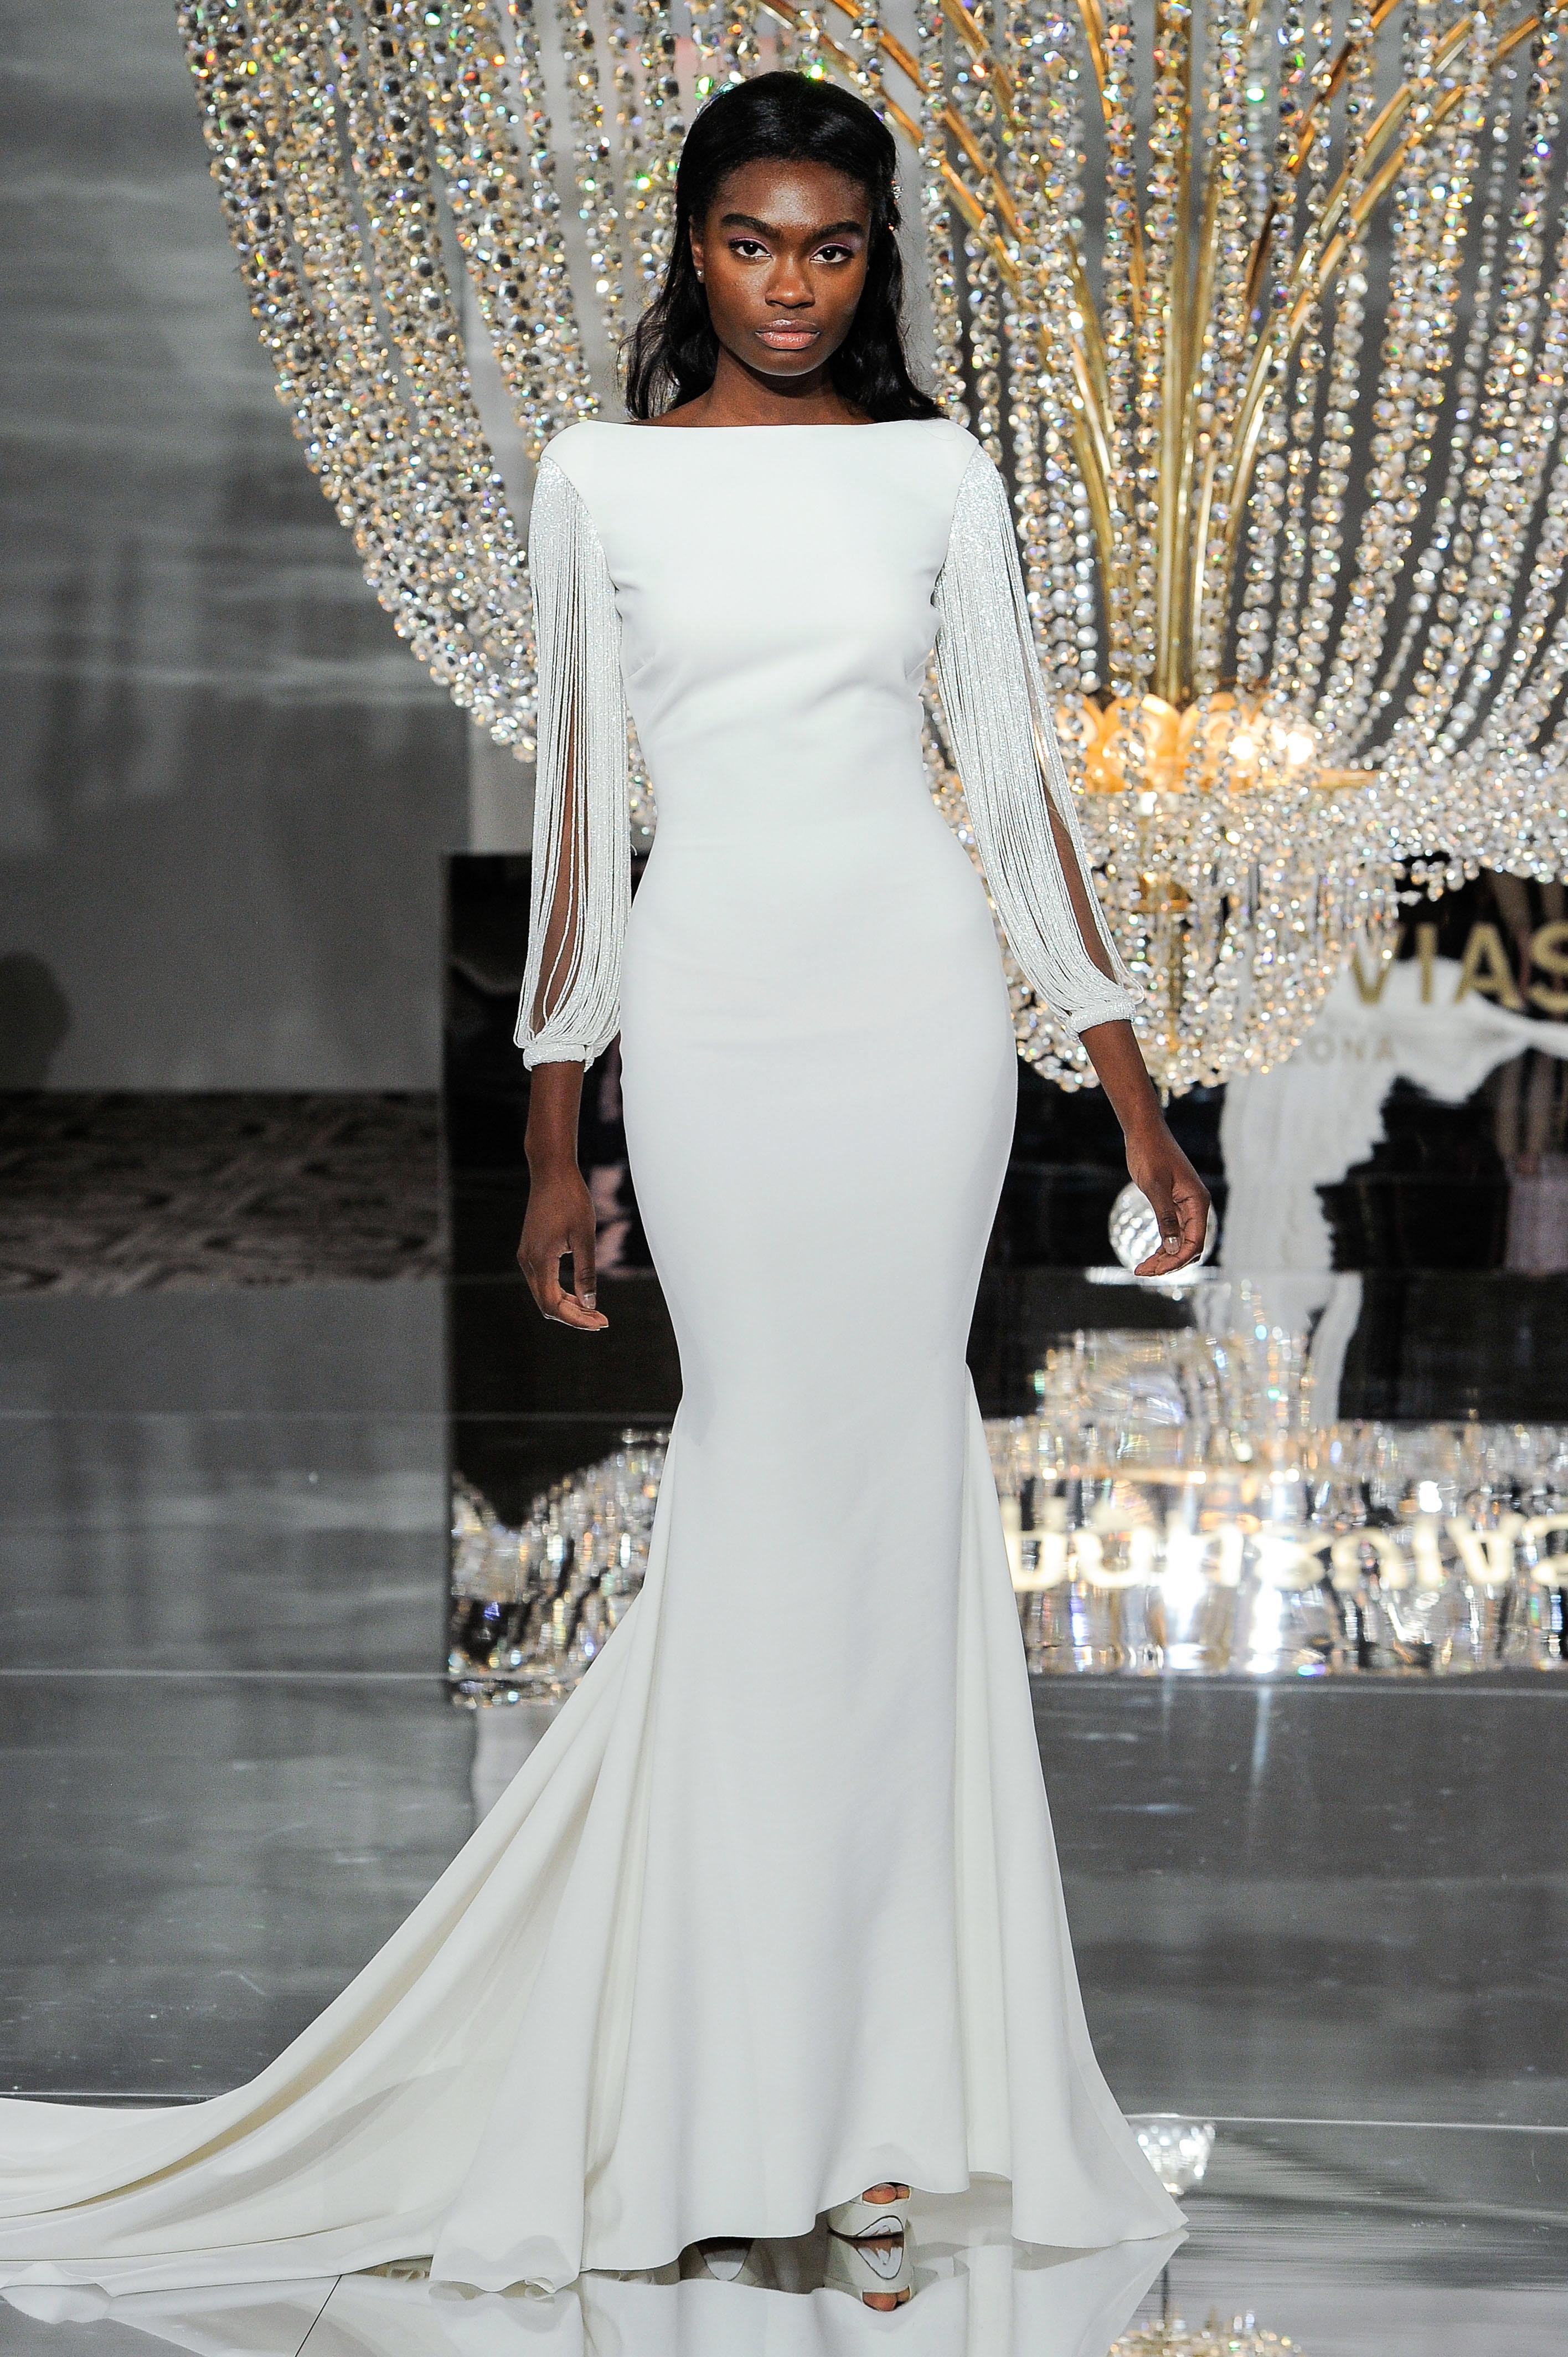 pronovias wedding dress fall 2018 long sleeve sheer lace mermaid